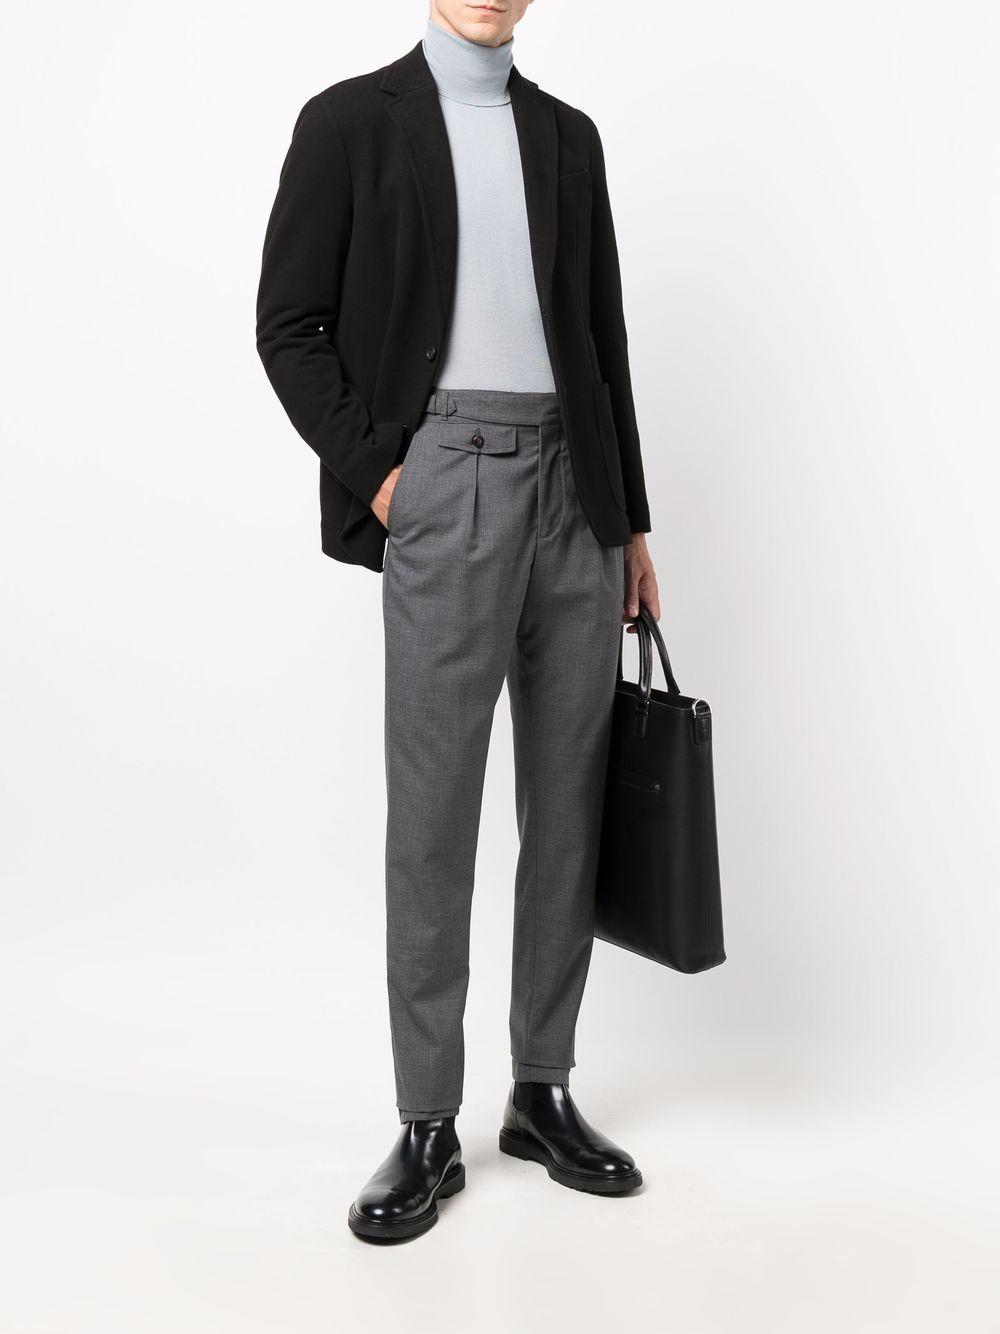 Pantaloni a vita alta in lana grigio medio ELEVENTY   Pantaloni   D75PAND03-TES0D05514